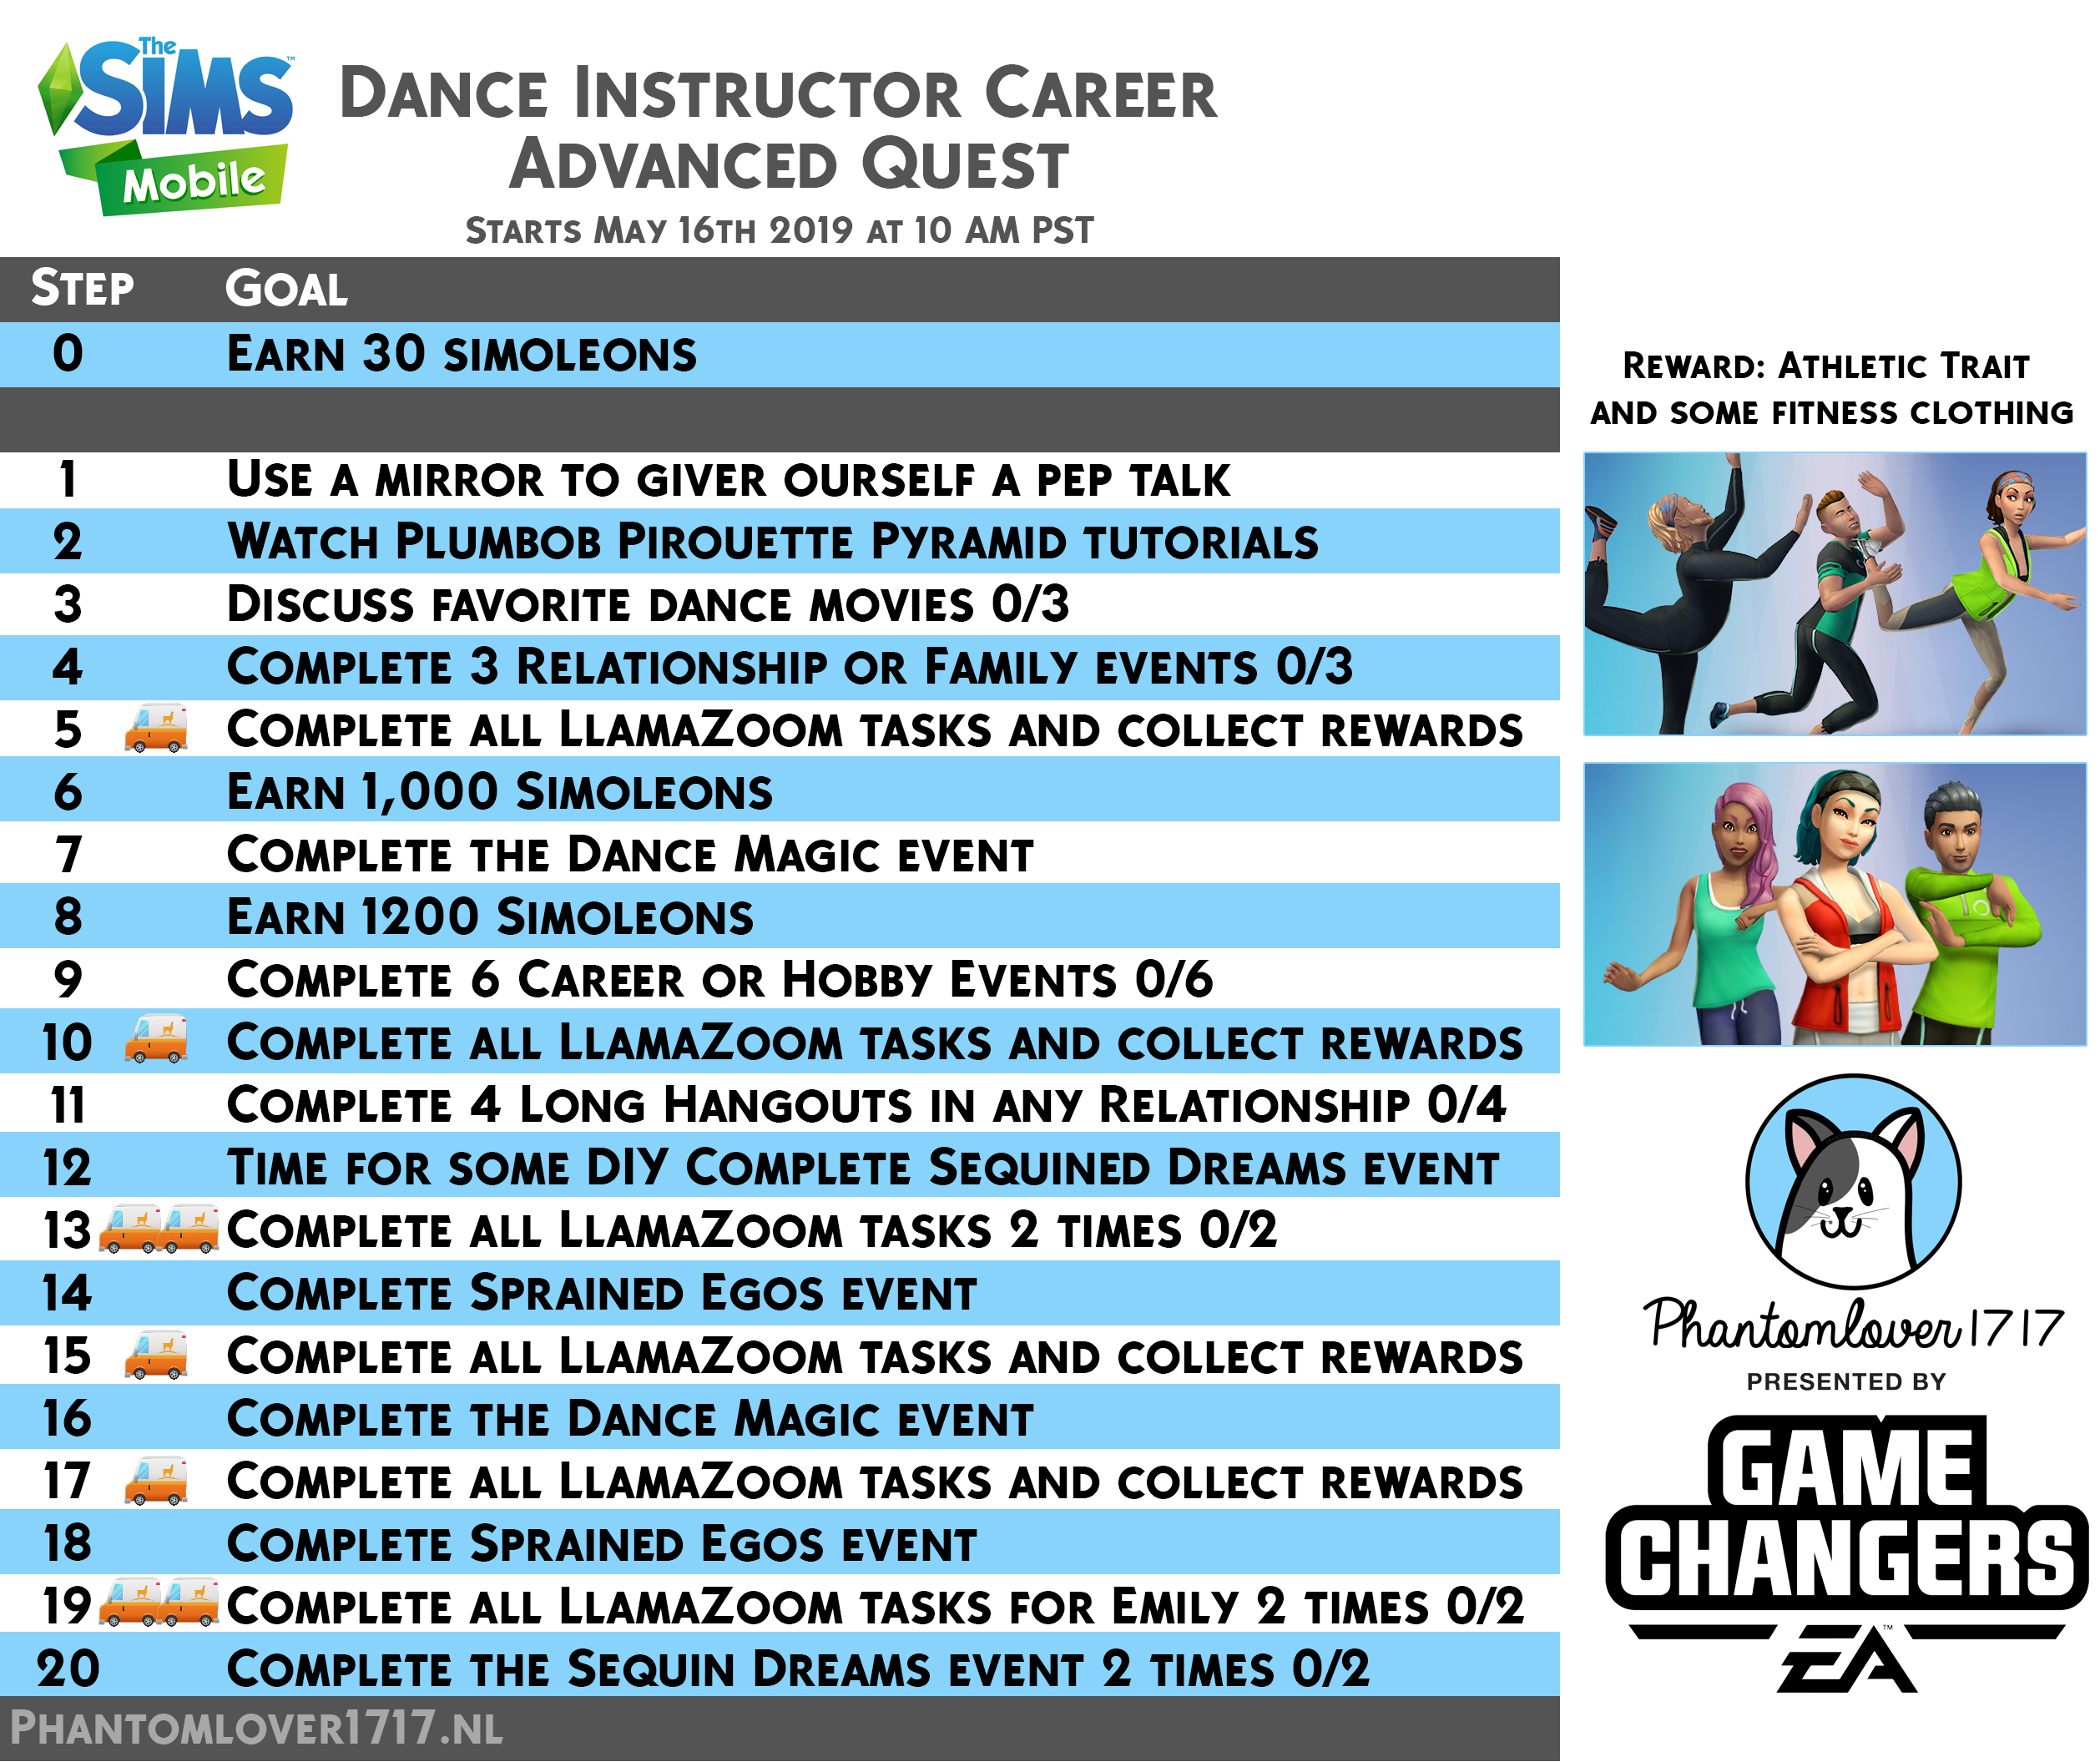 DanceinstructorAdvanced.jpg